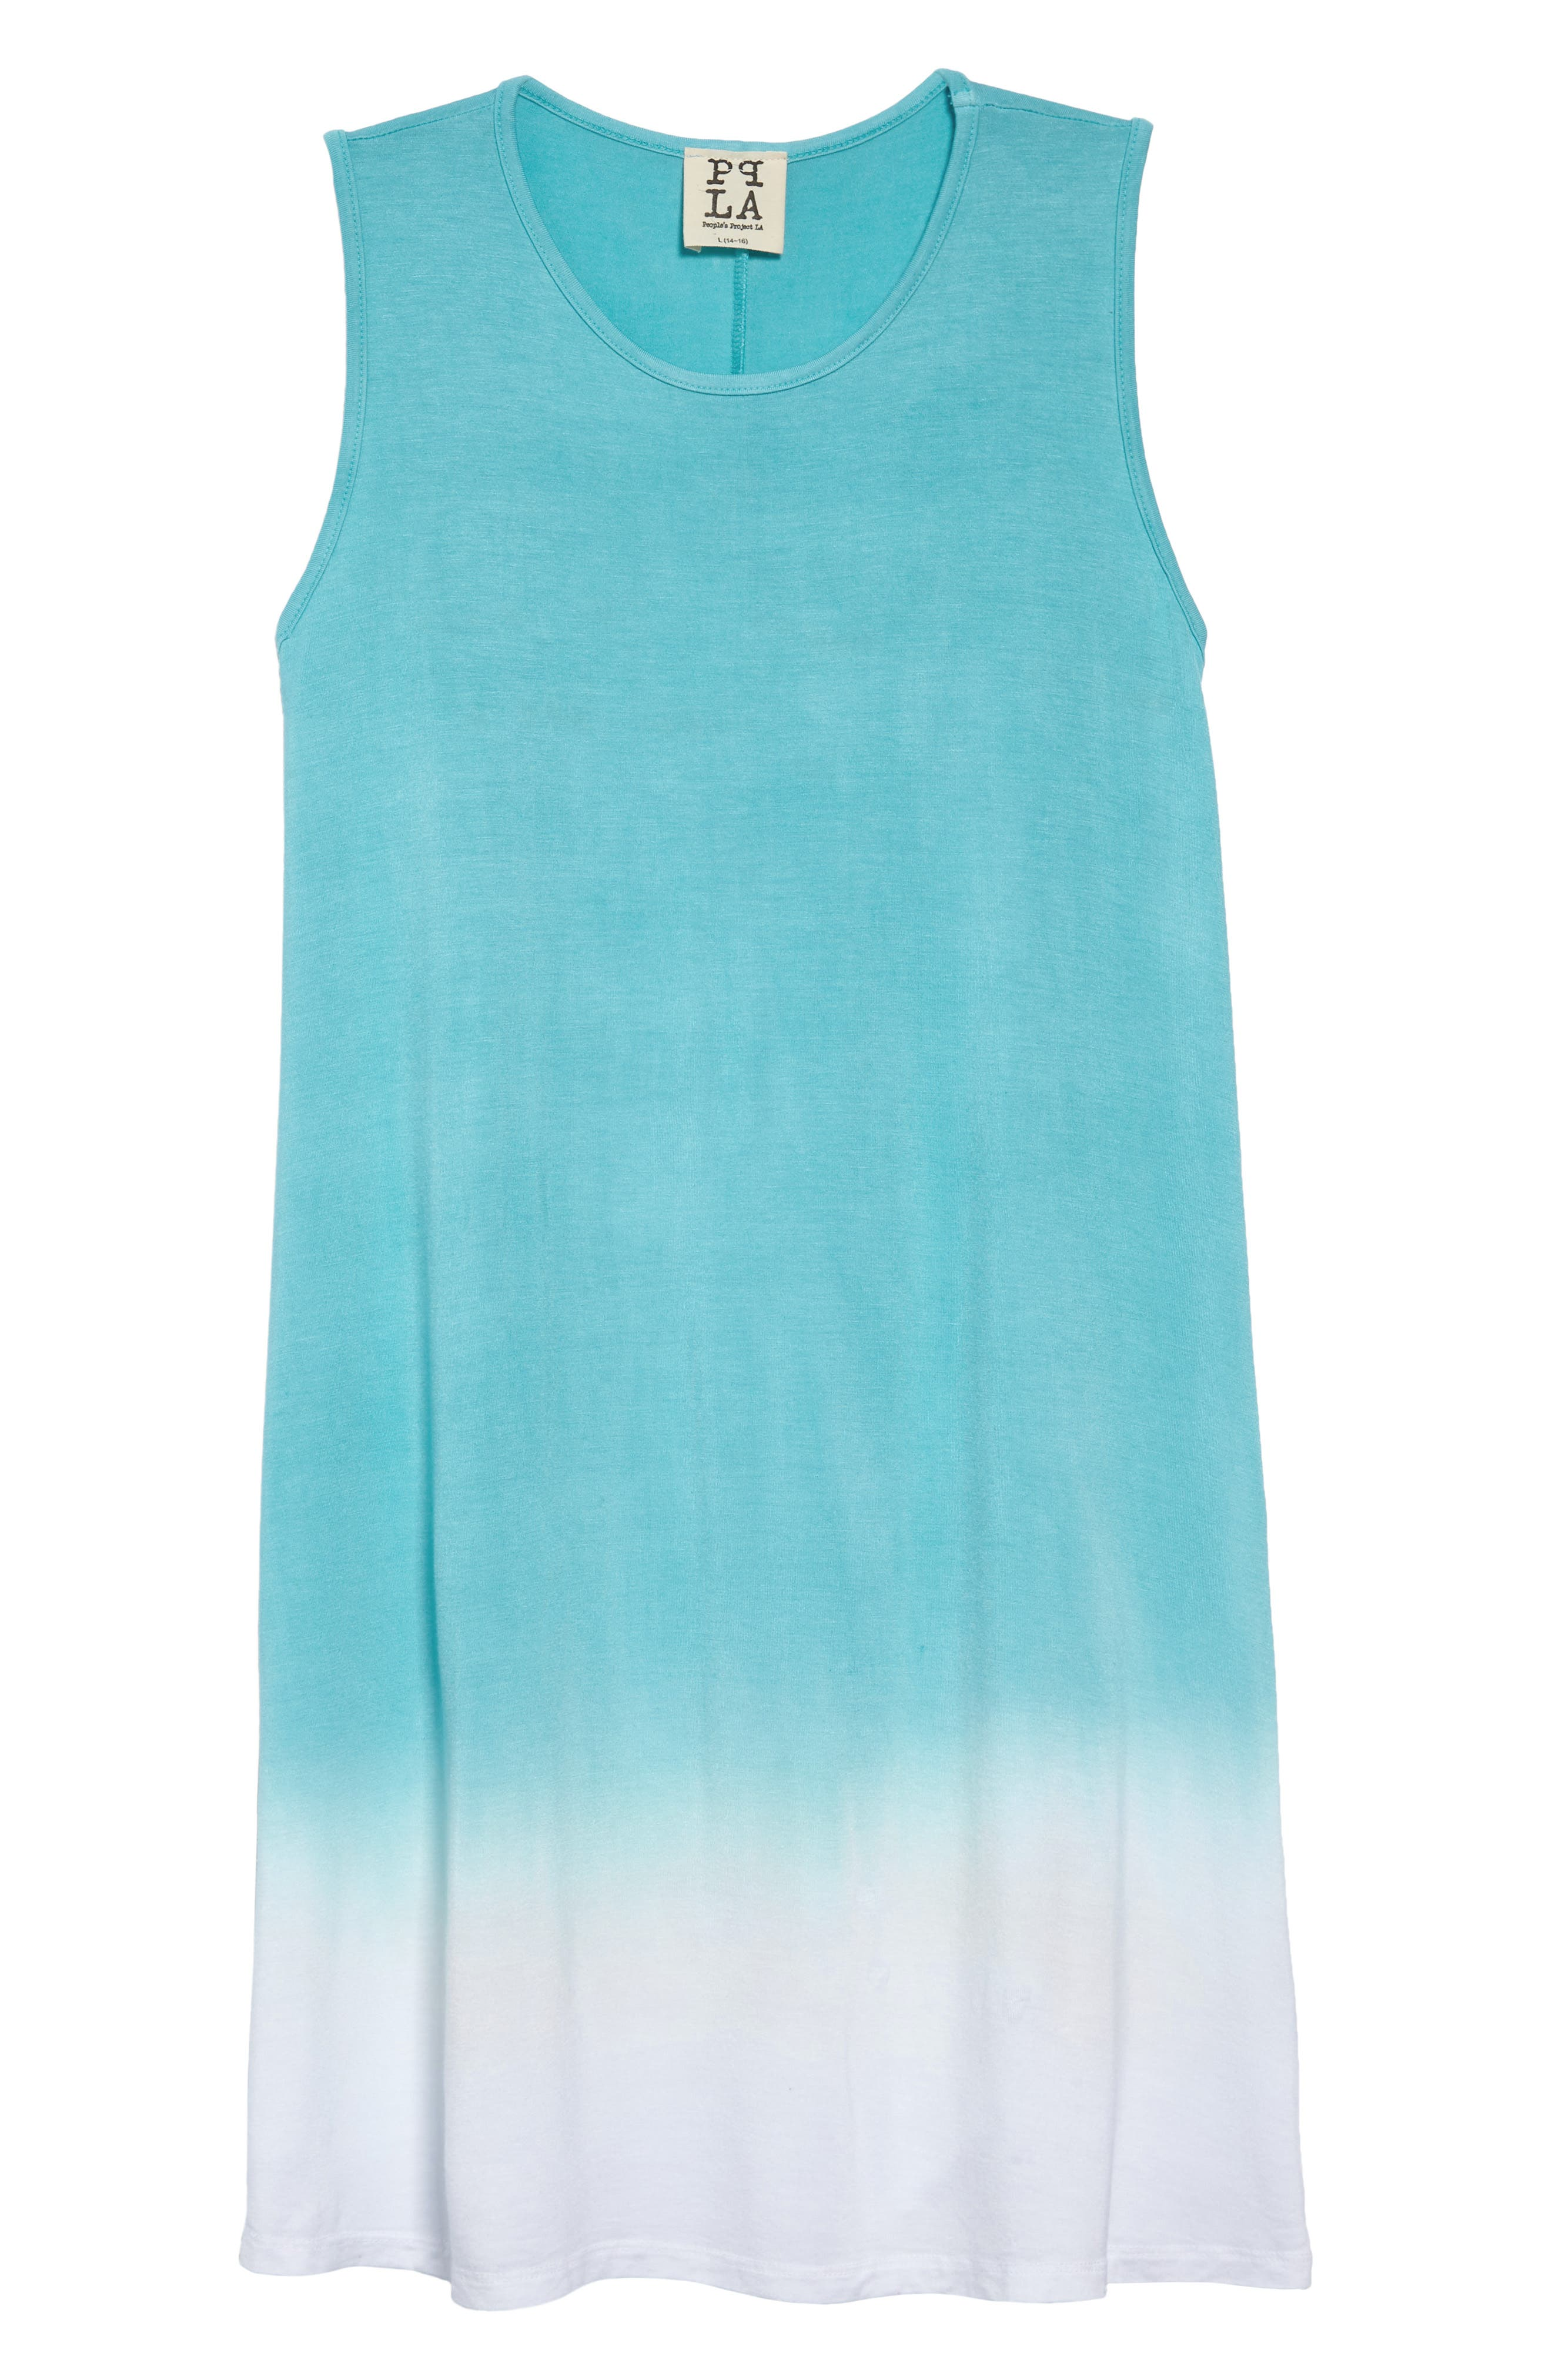 PPLA Grenadine Ombré T-Shirt Dress (Big Girls)